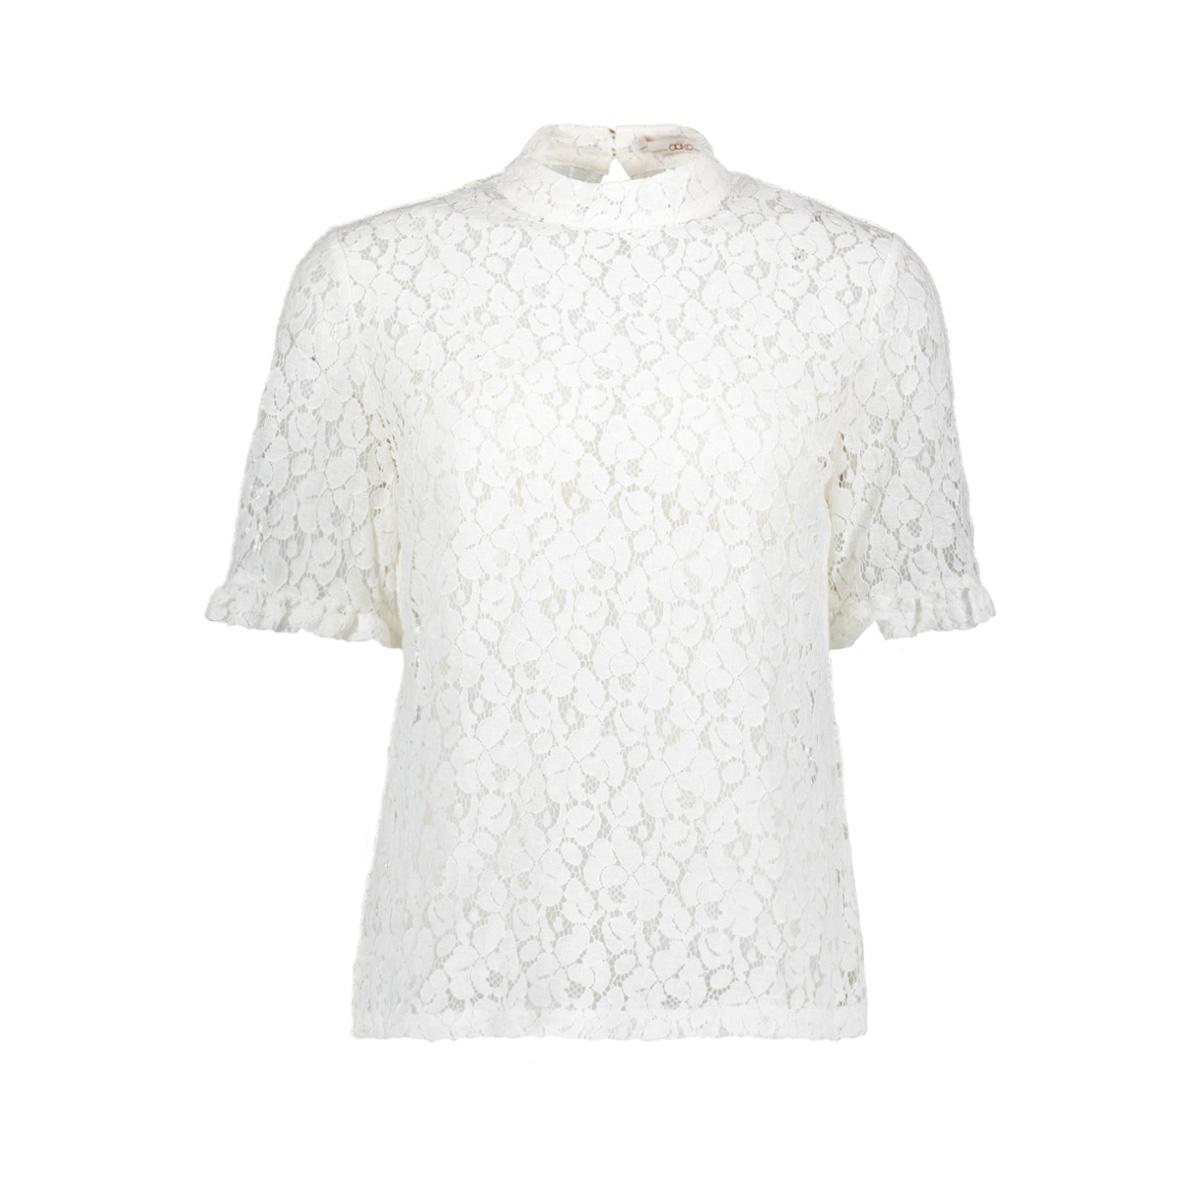 tulia co 220 aaiko t-shirt les blancs